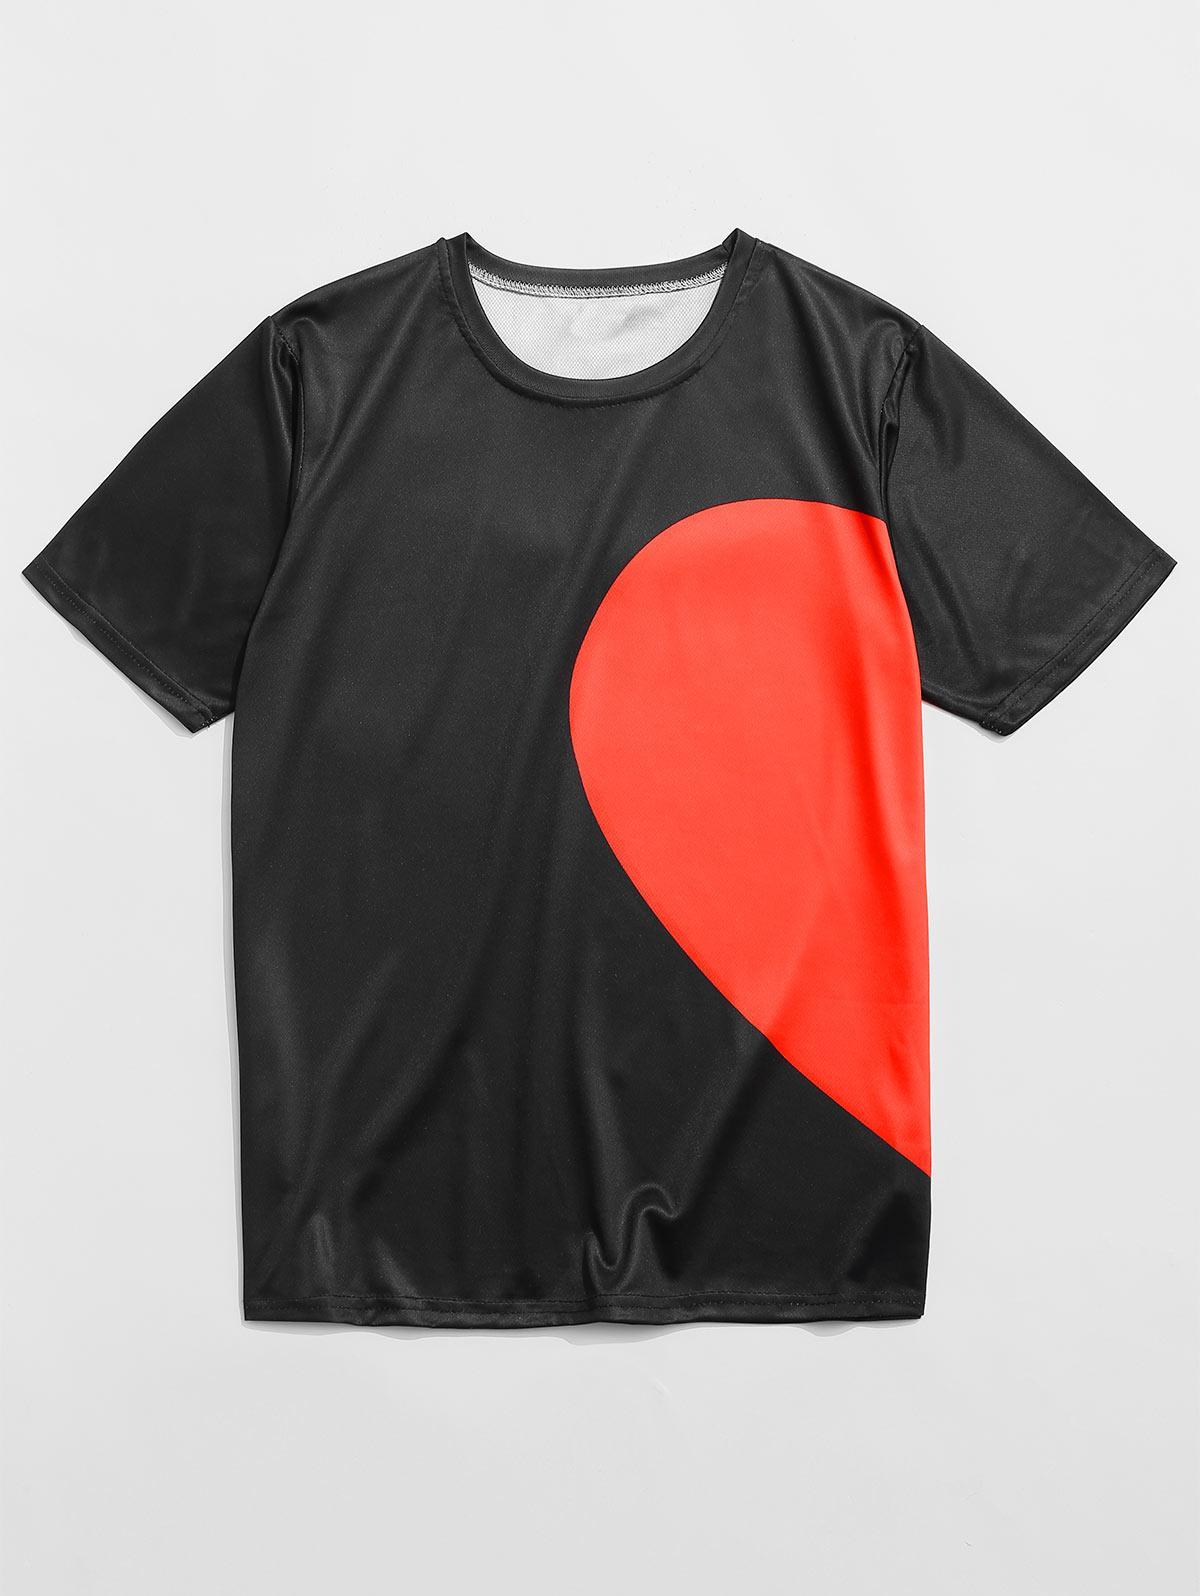 Half Heart Print Contrast Casual T-shirt thumbnail